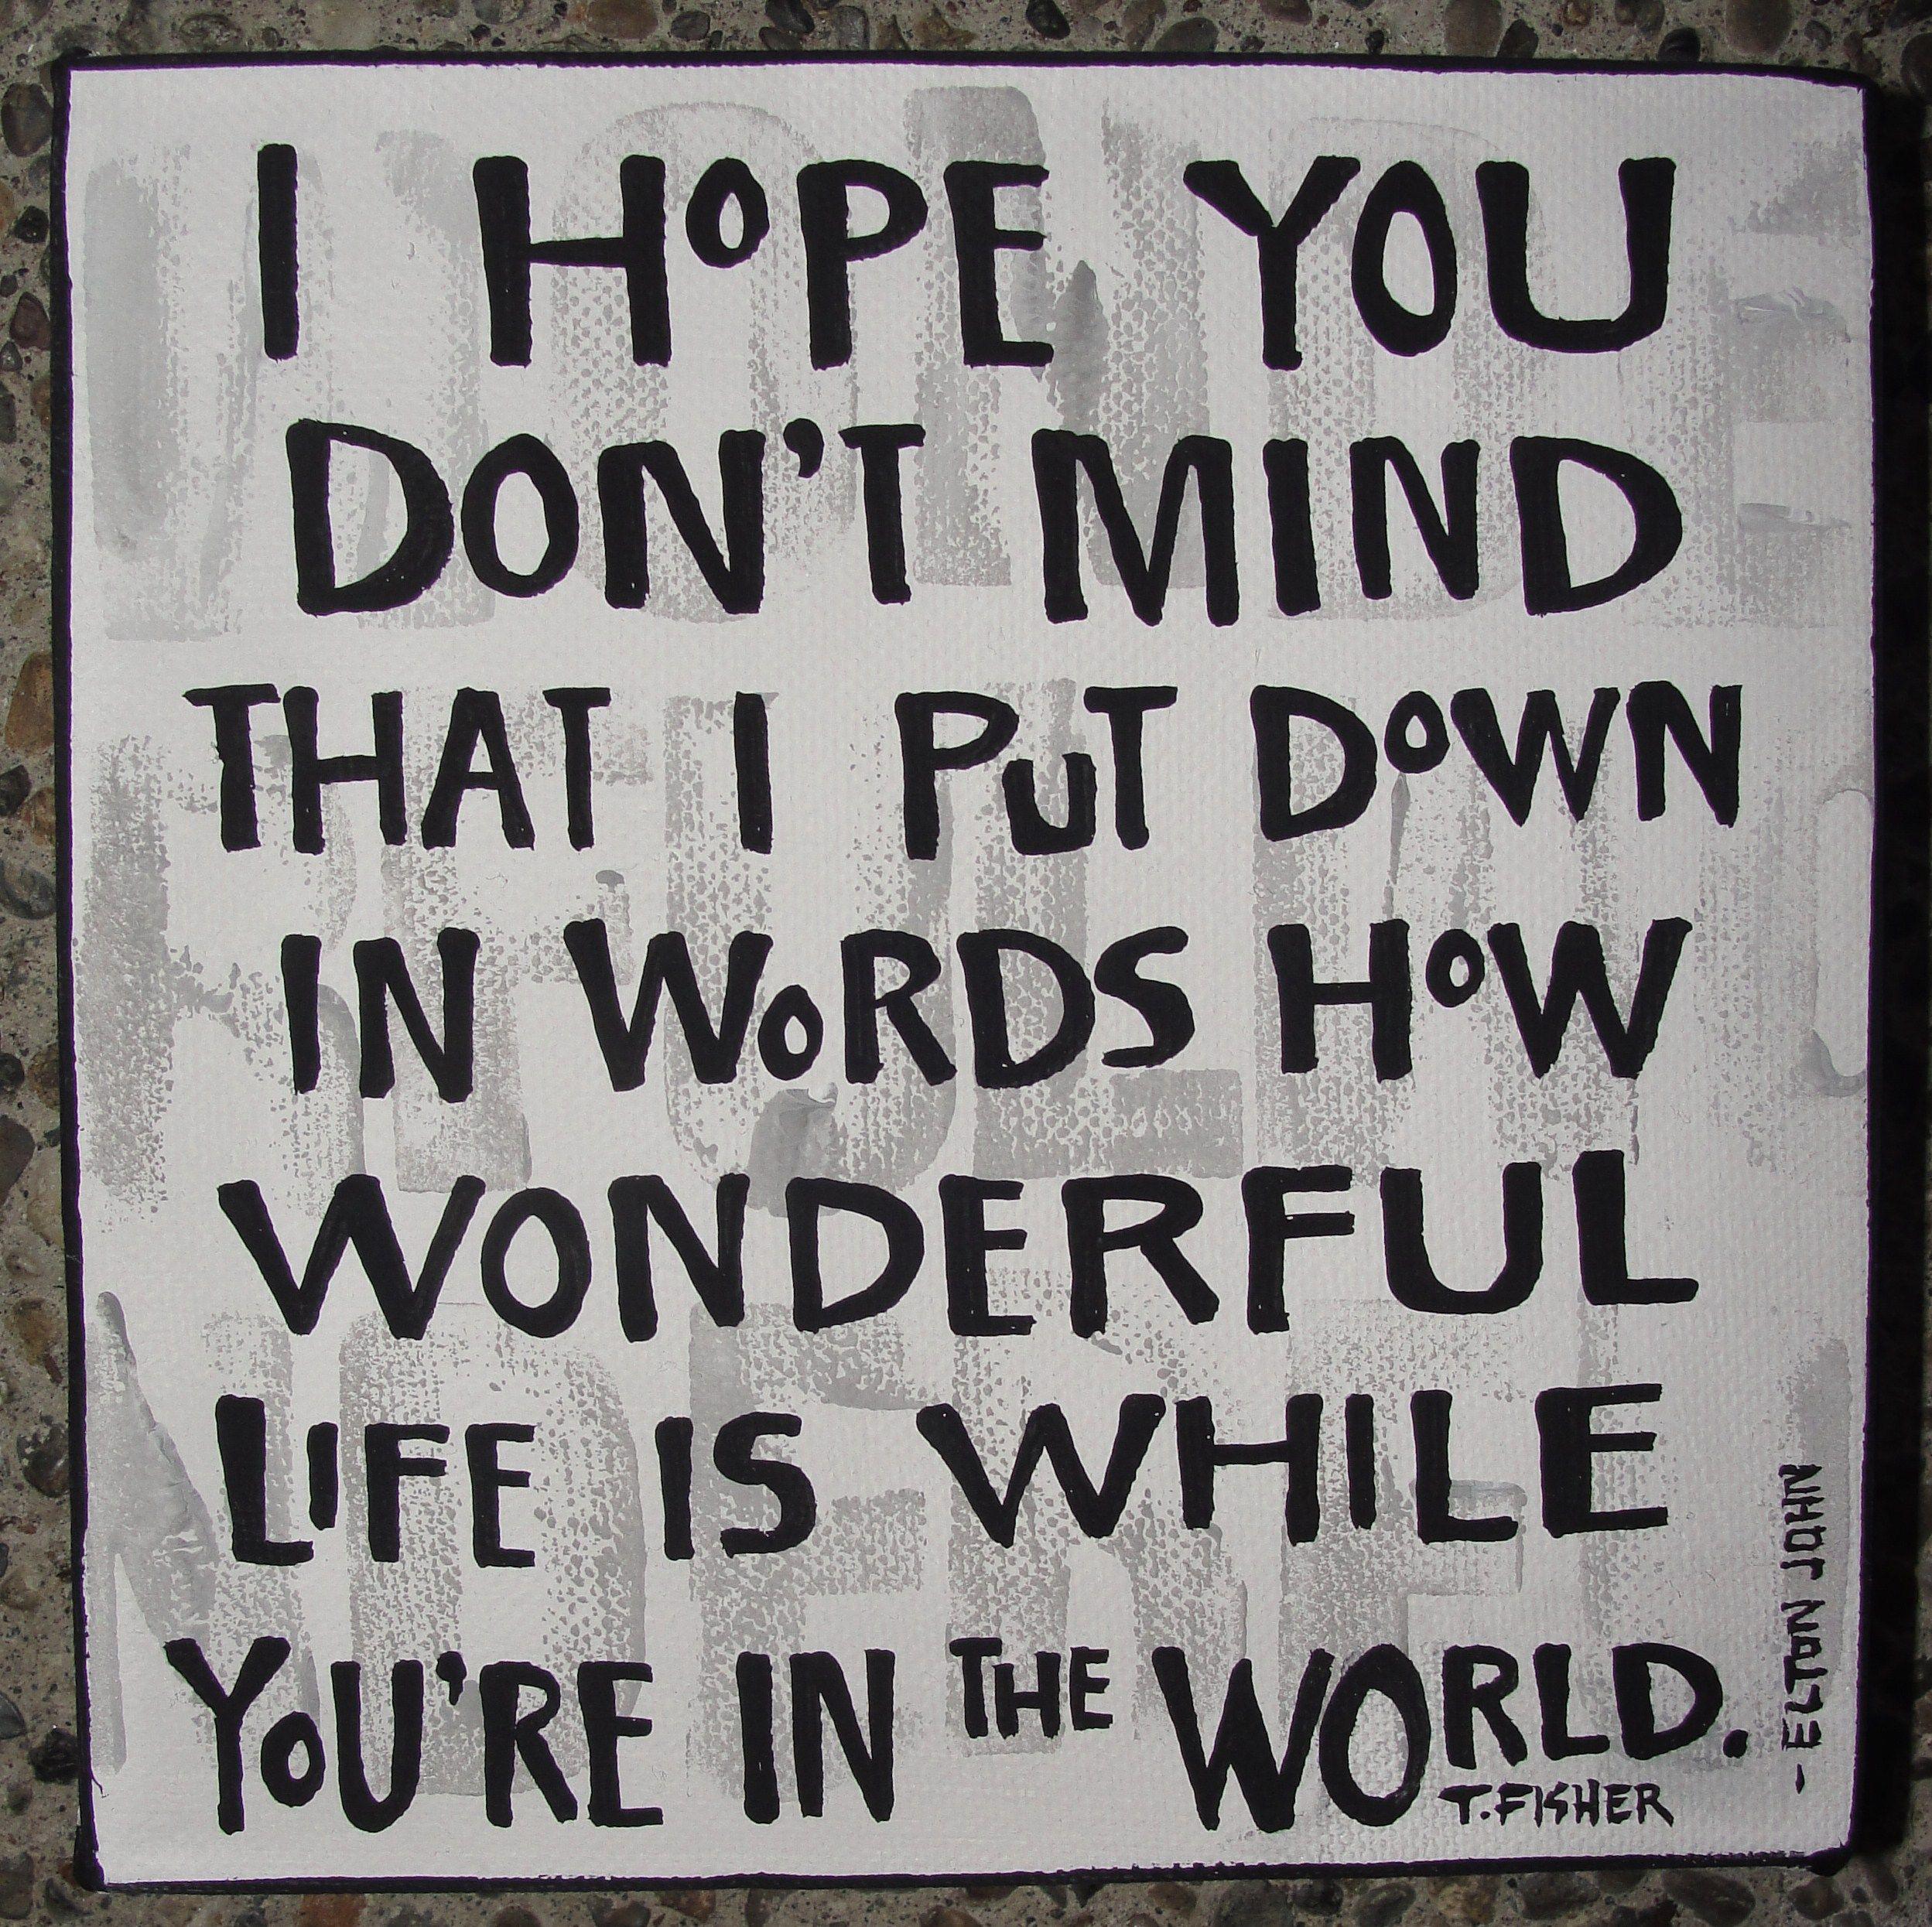 Wonderful Life Quotes: Tracy Fisher Art Http://www.tfisherart.com/